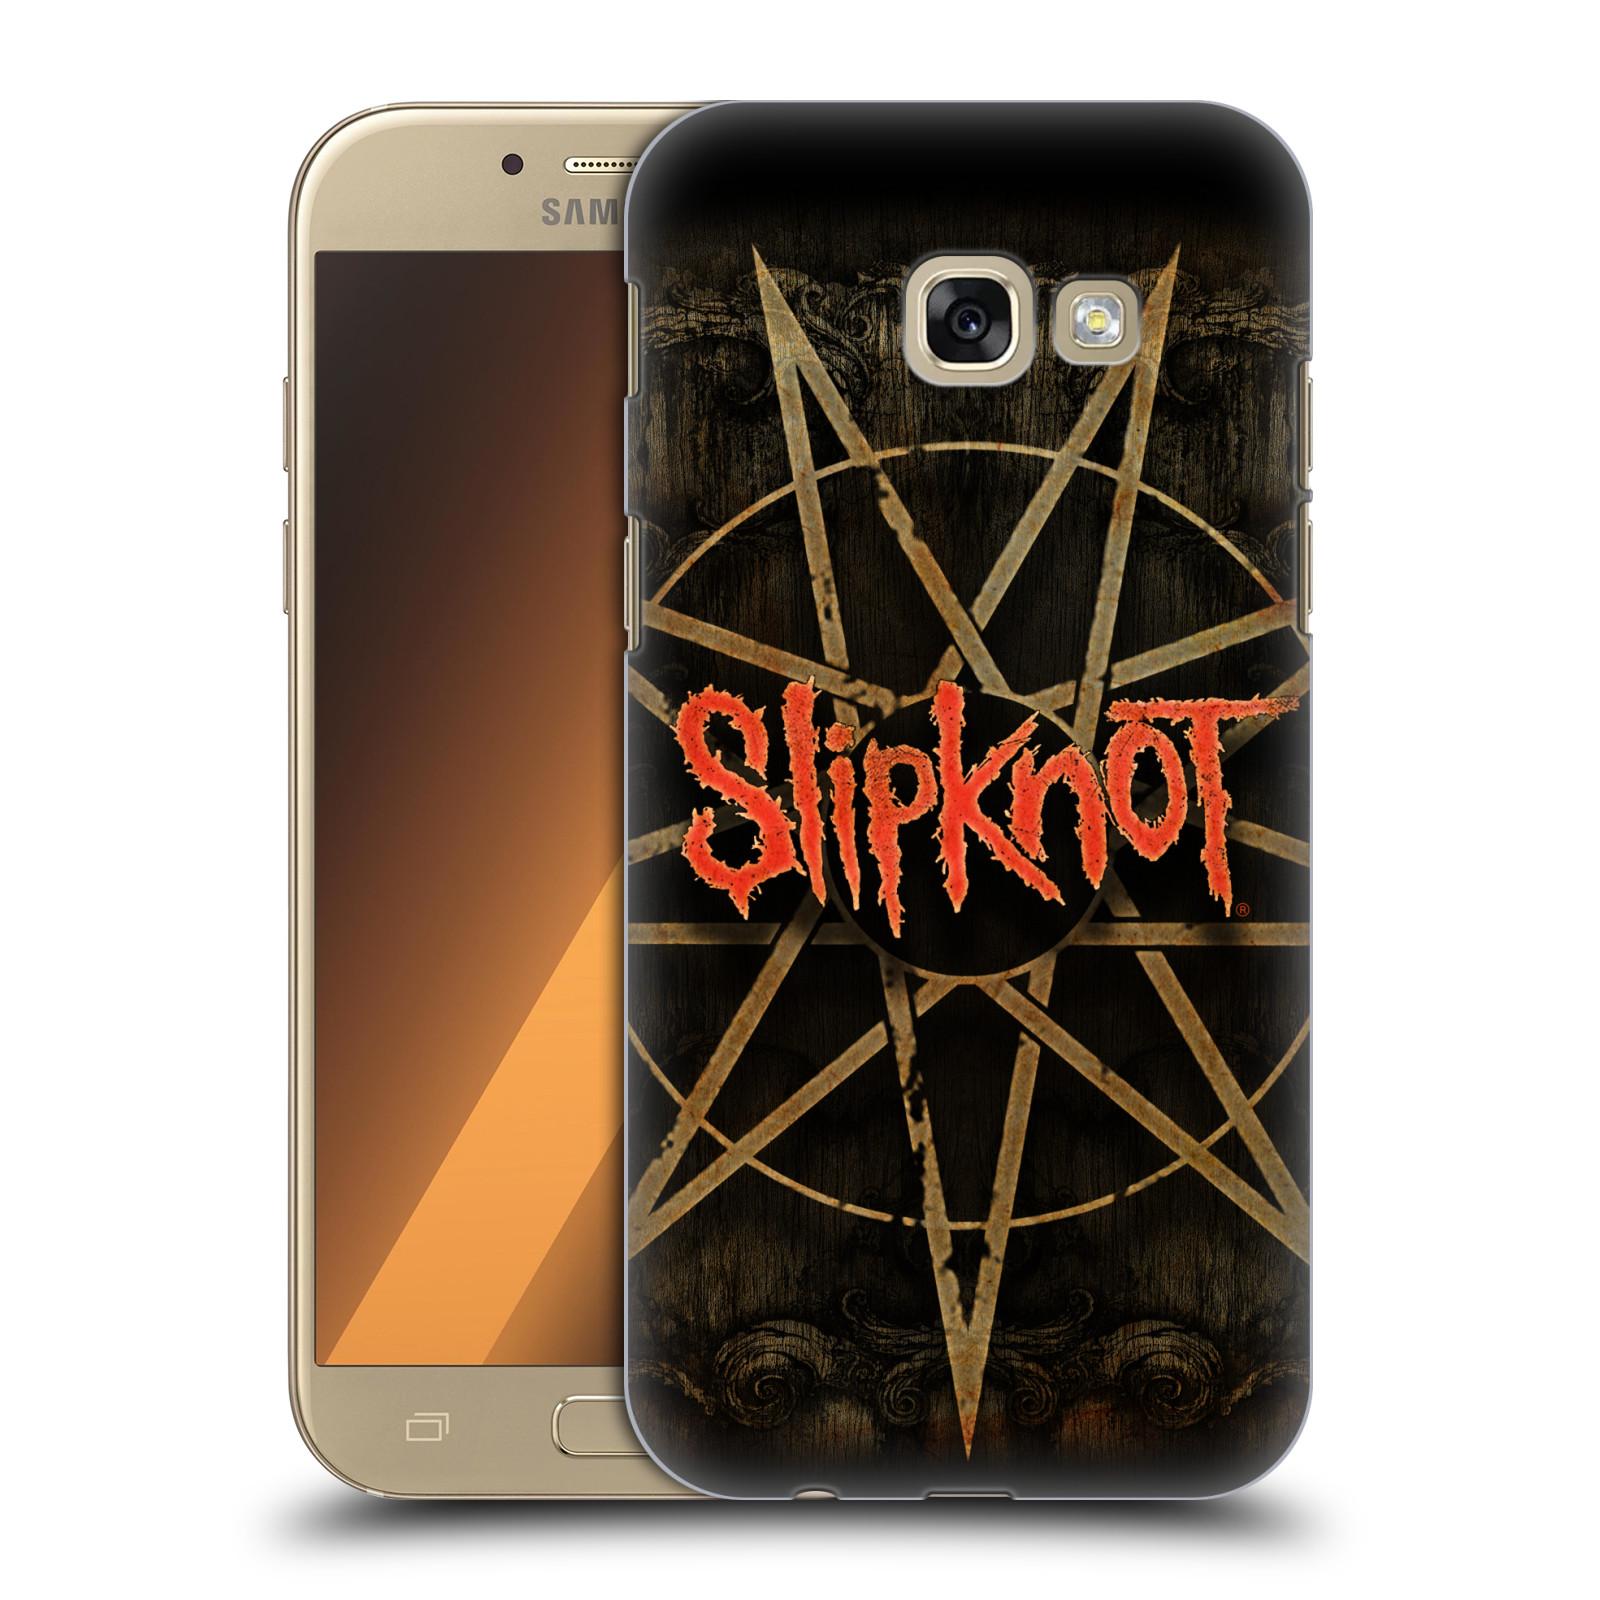 Plastové pouzdro na mobil Samsung Galaxy A5 (2017) HEAD CASE Slipknot - Znak